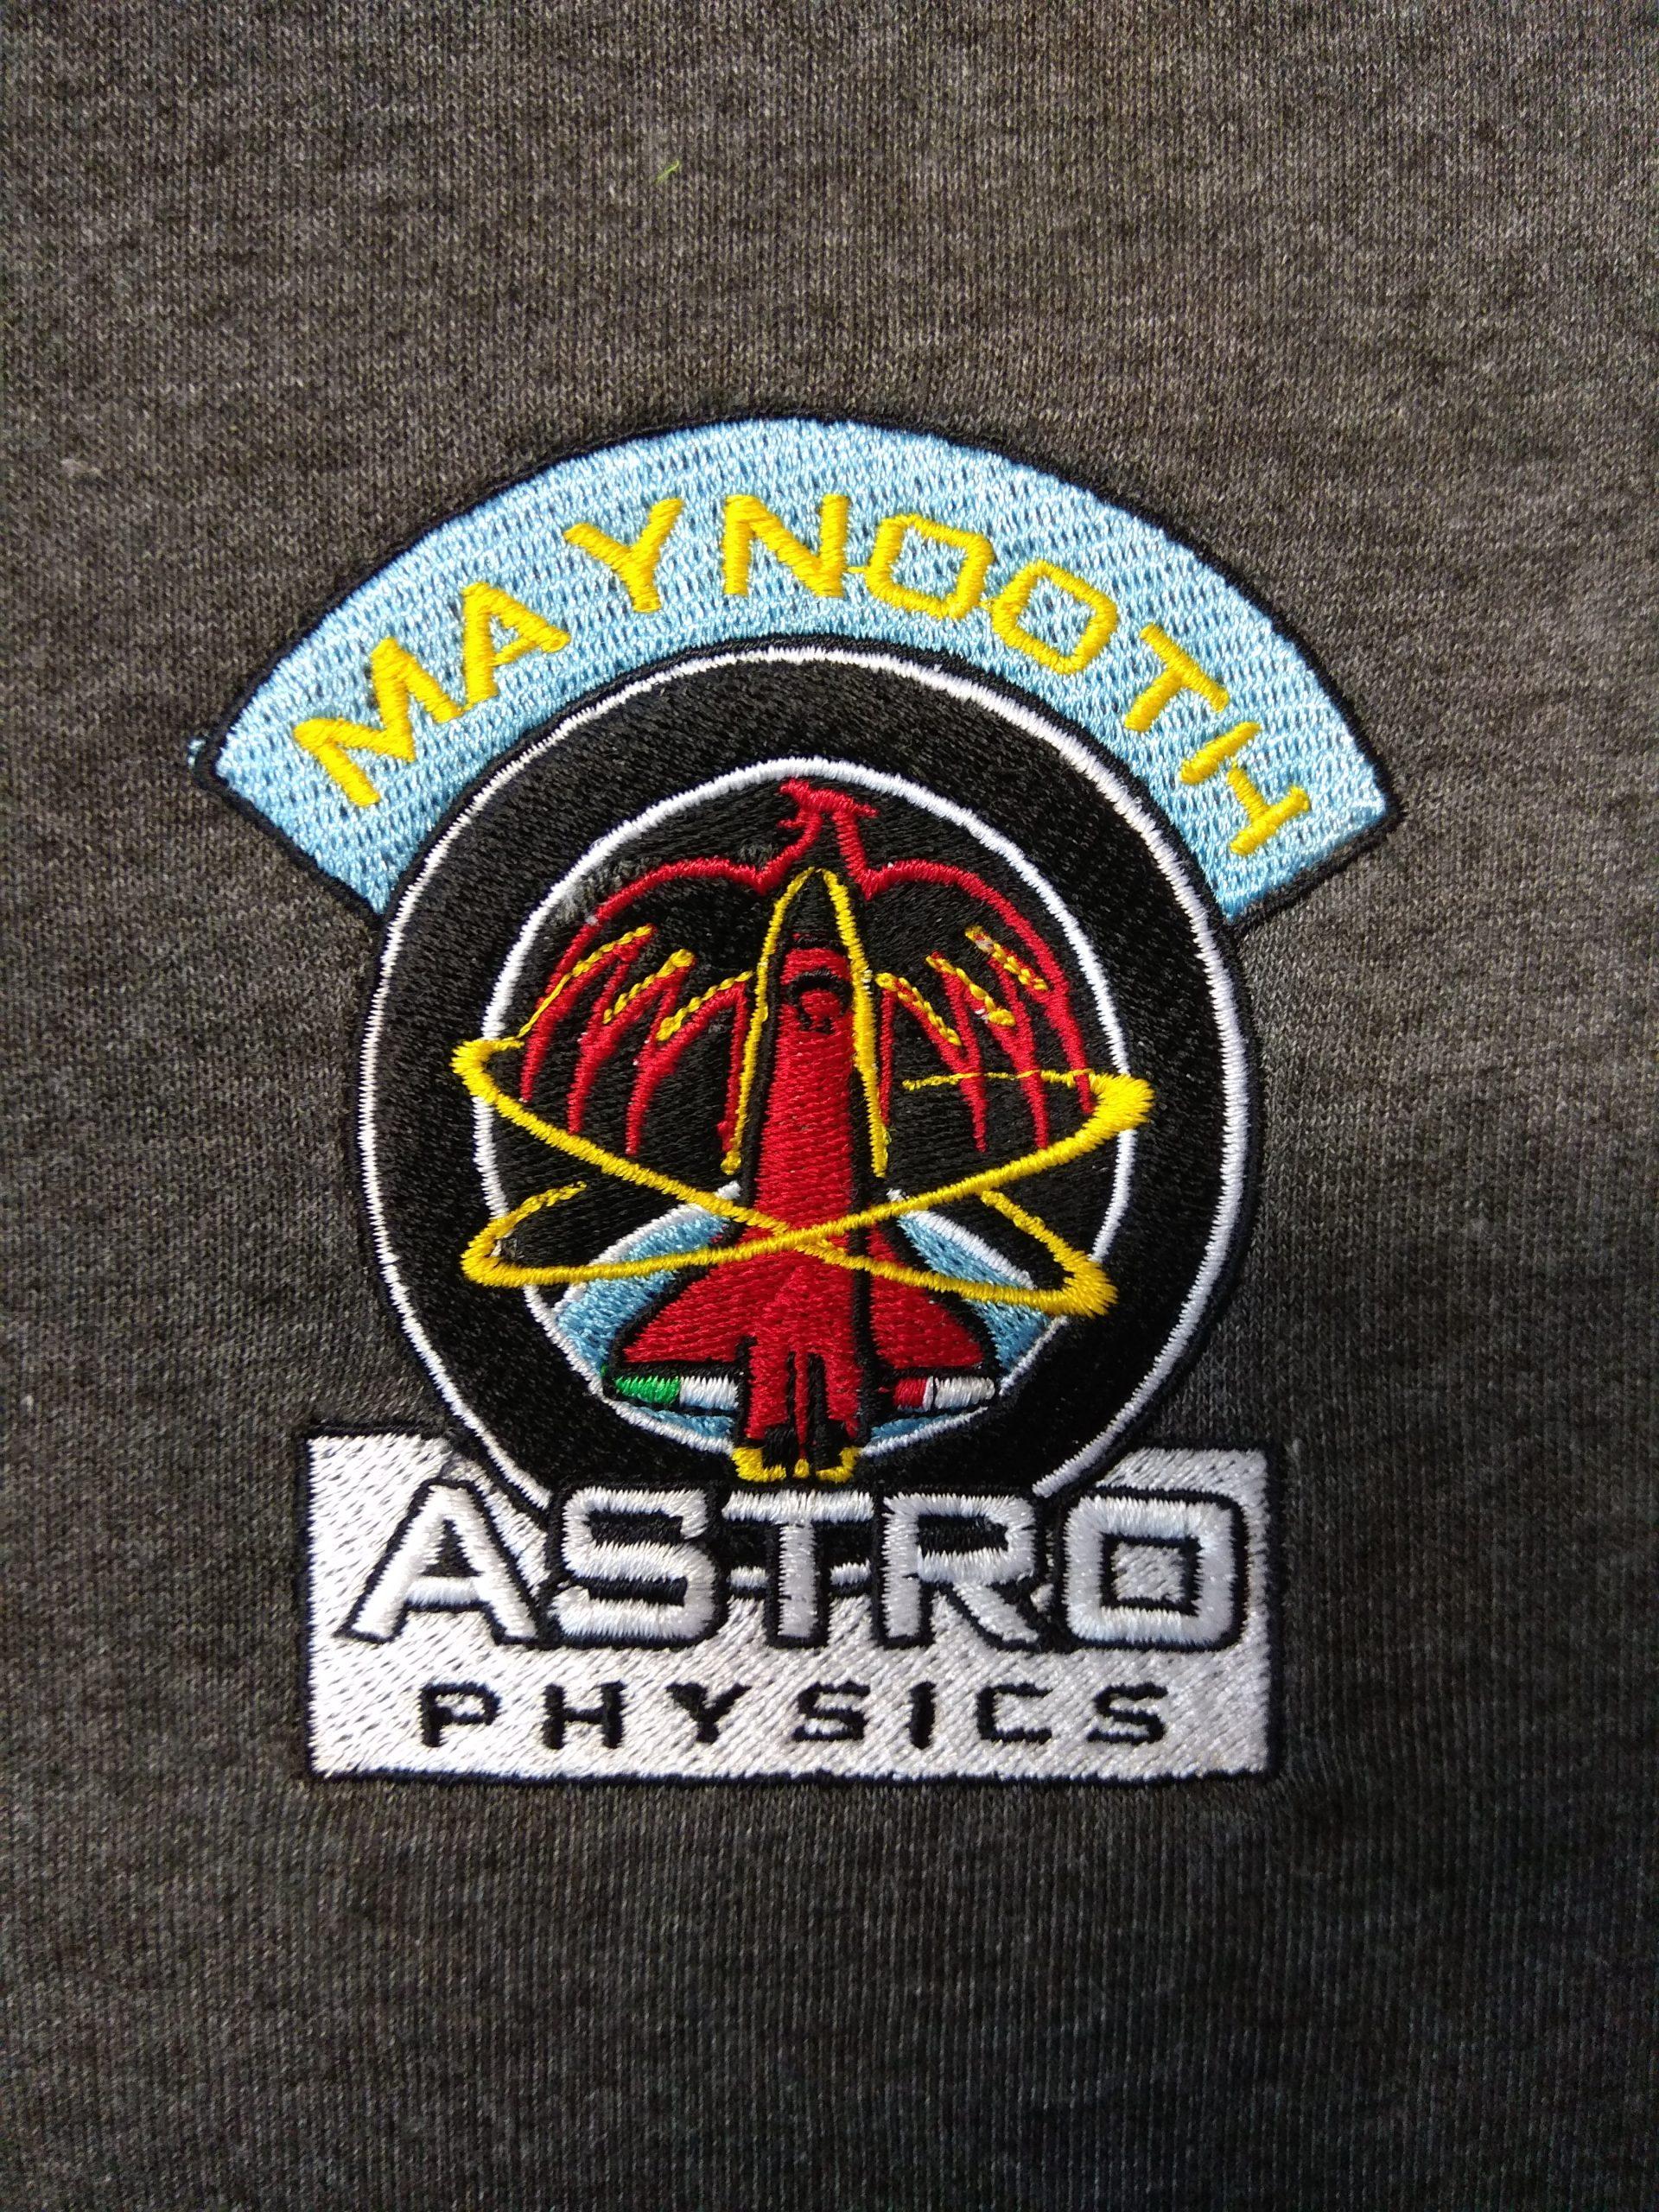 Astro Physics Badge Example